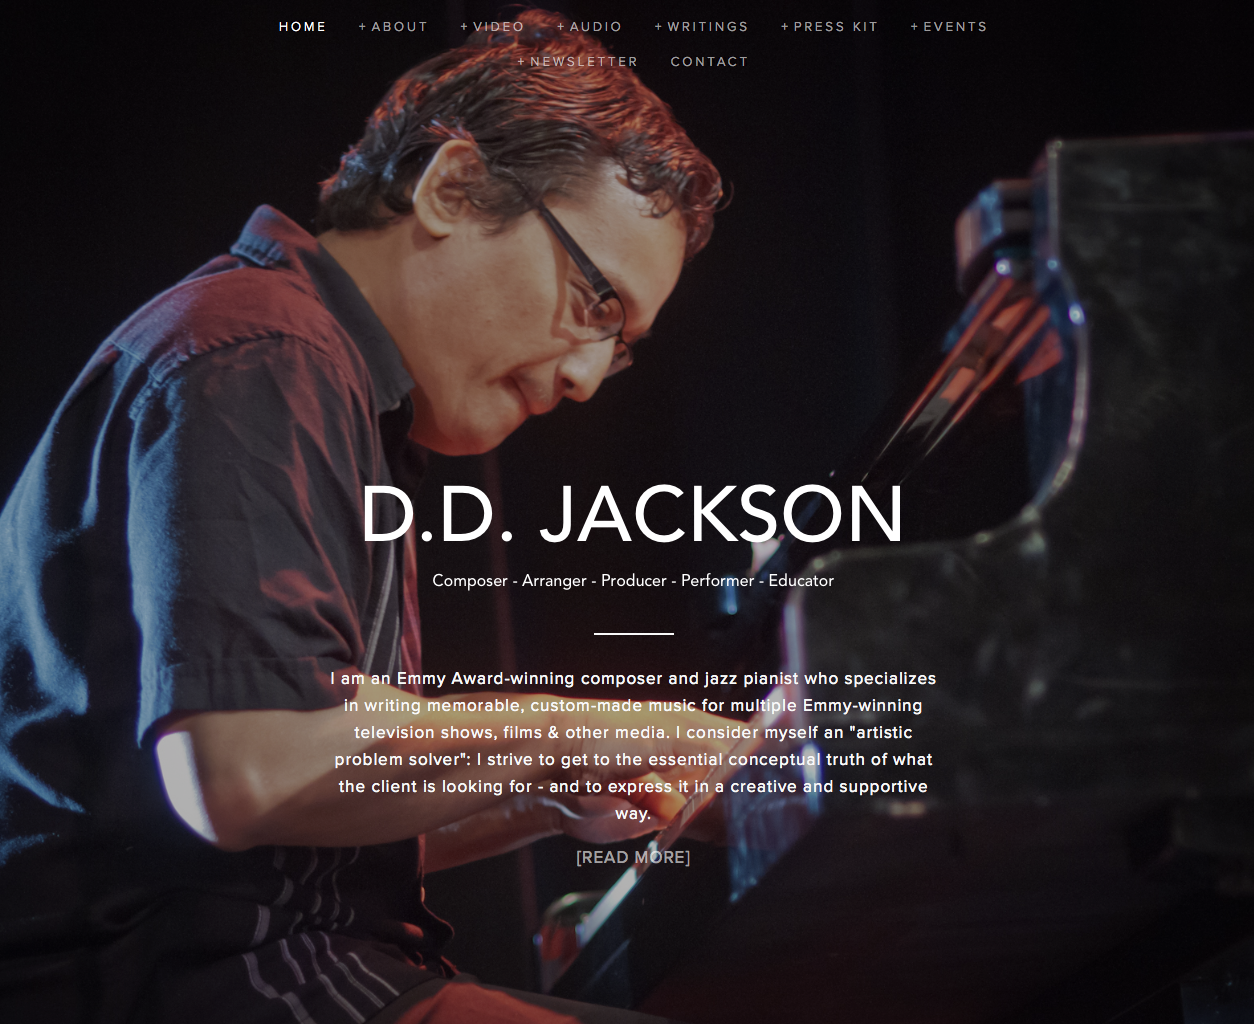 My new ddjackson.com website :-)